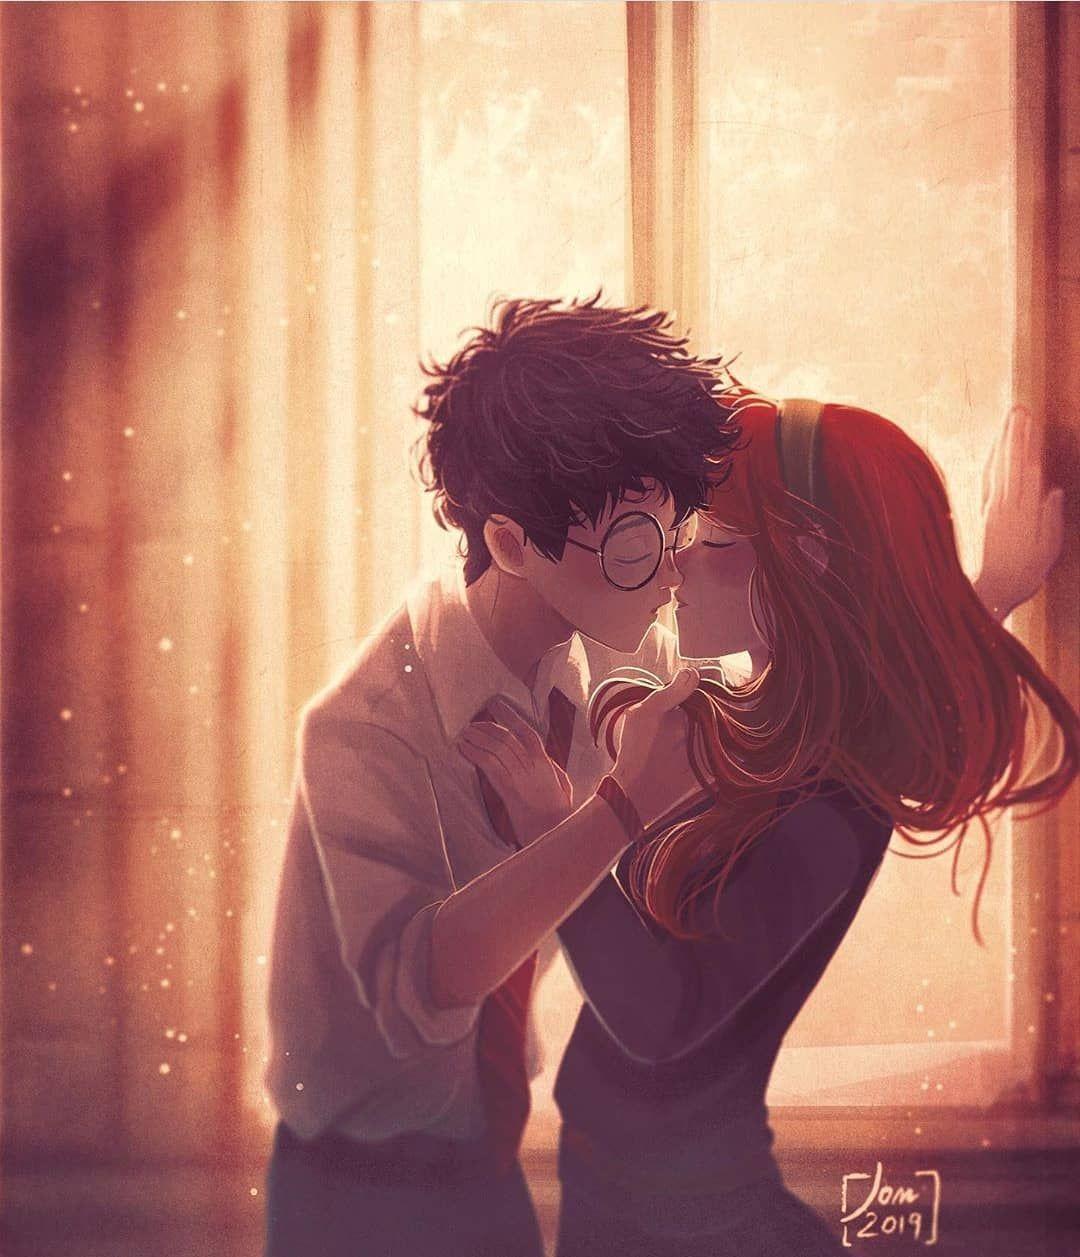 Roseful dating